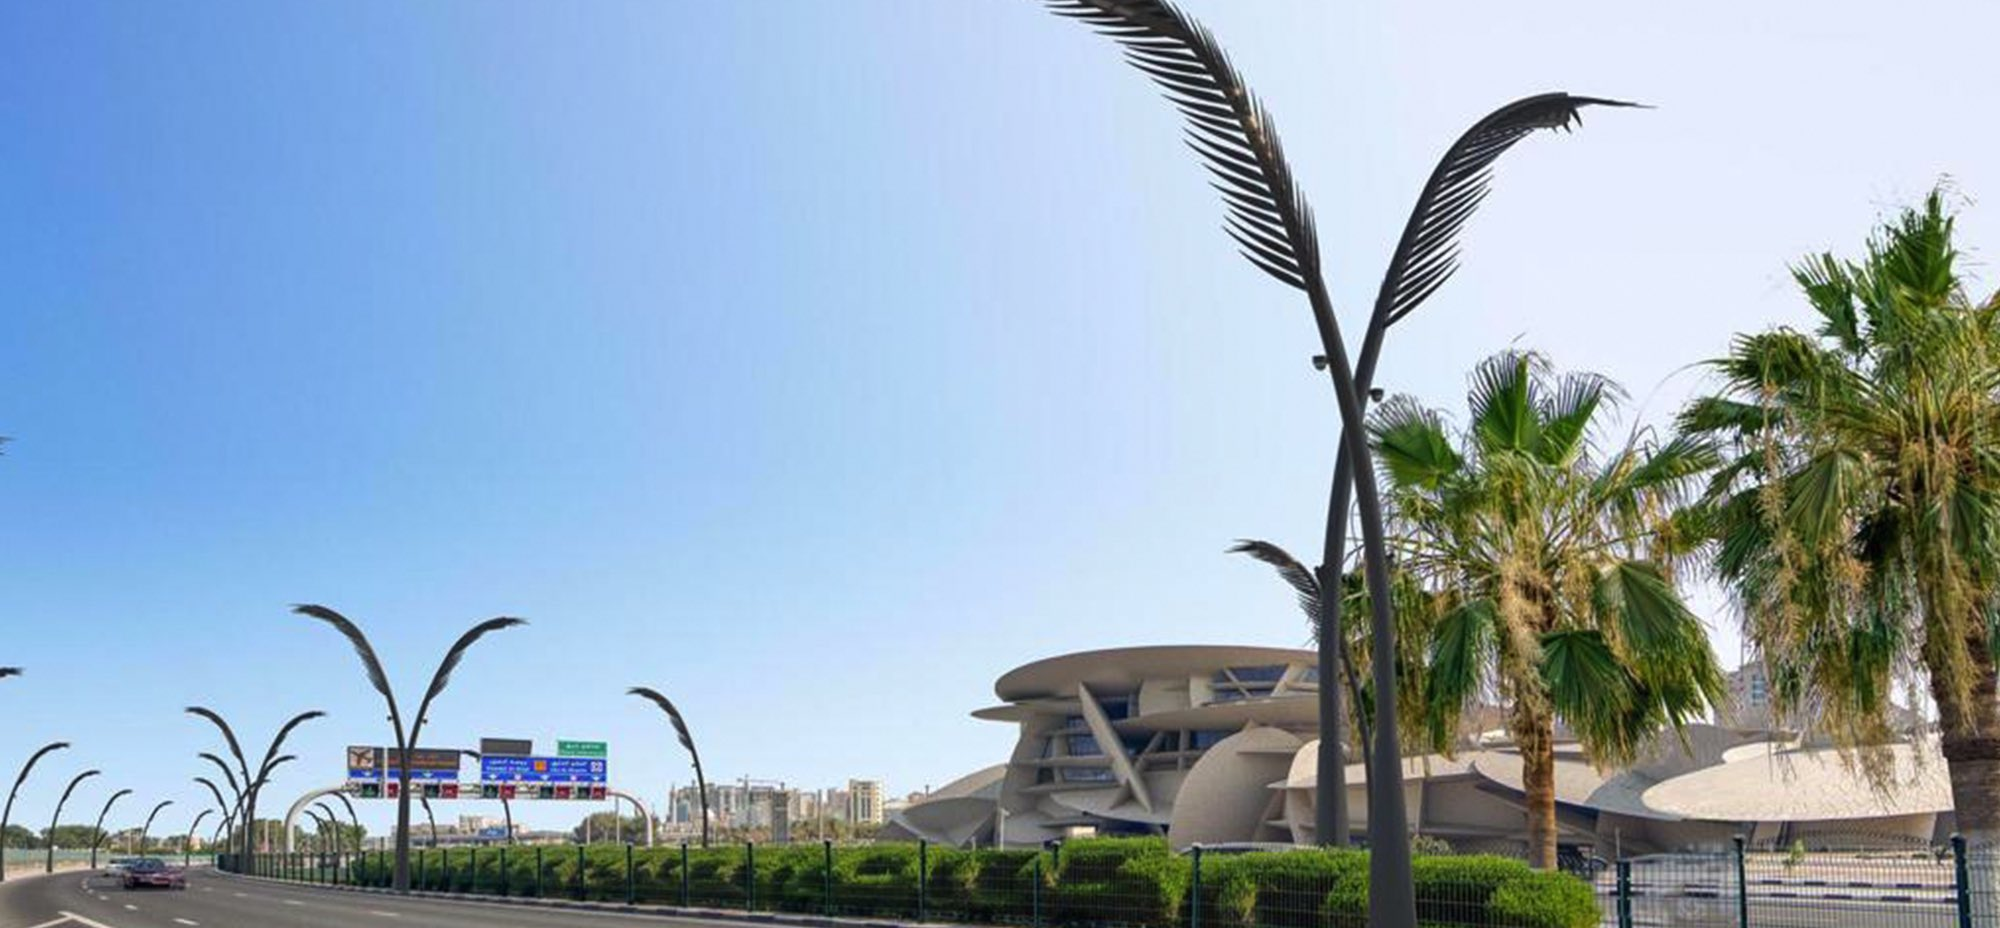 2,600 lighting poles to decorate Doha Corniche and Doha central area